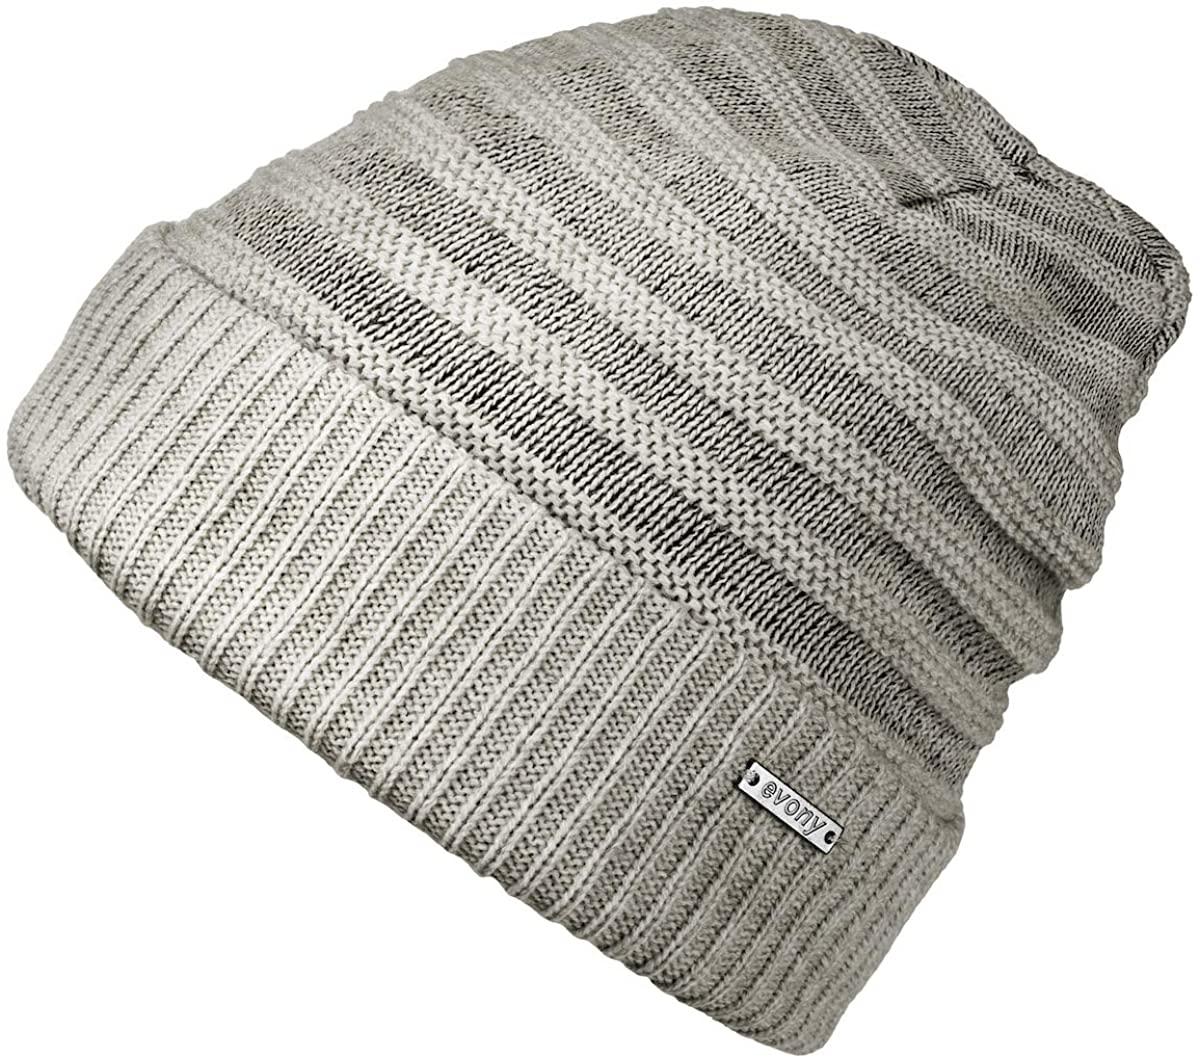 Revony Cuffed Beanie Hat - Warm Fleece Band Inside The hat - BE16